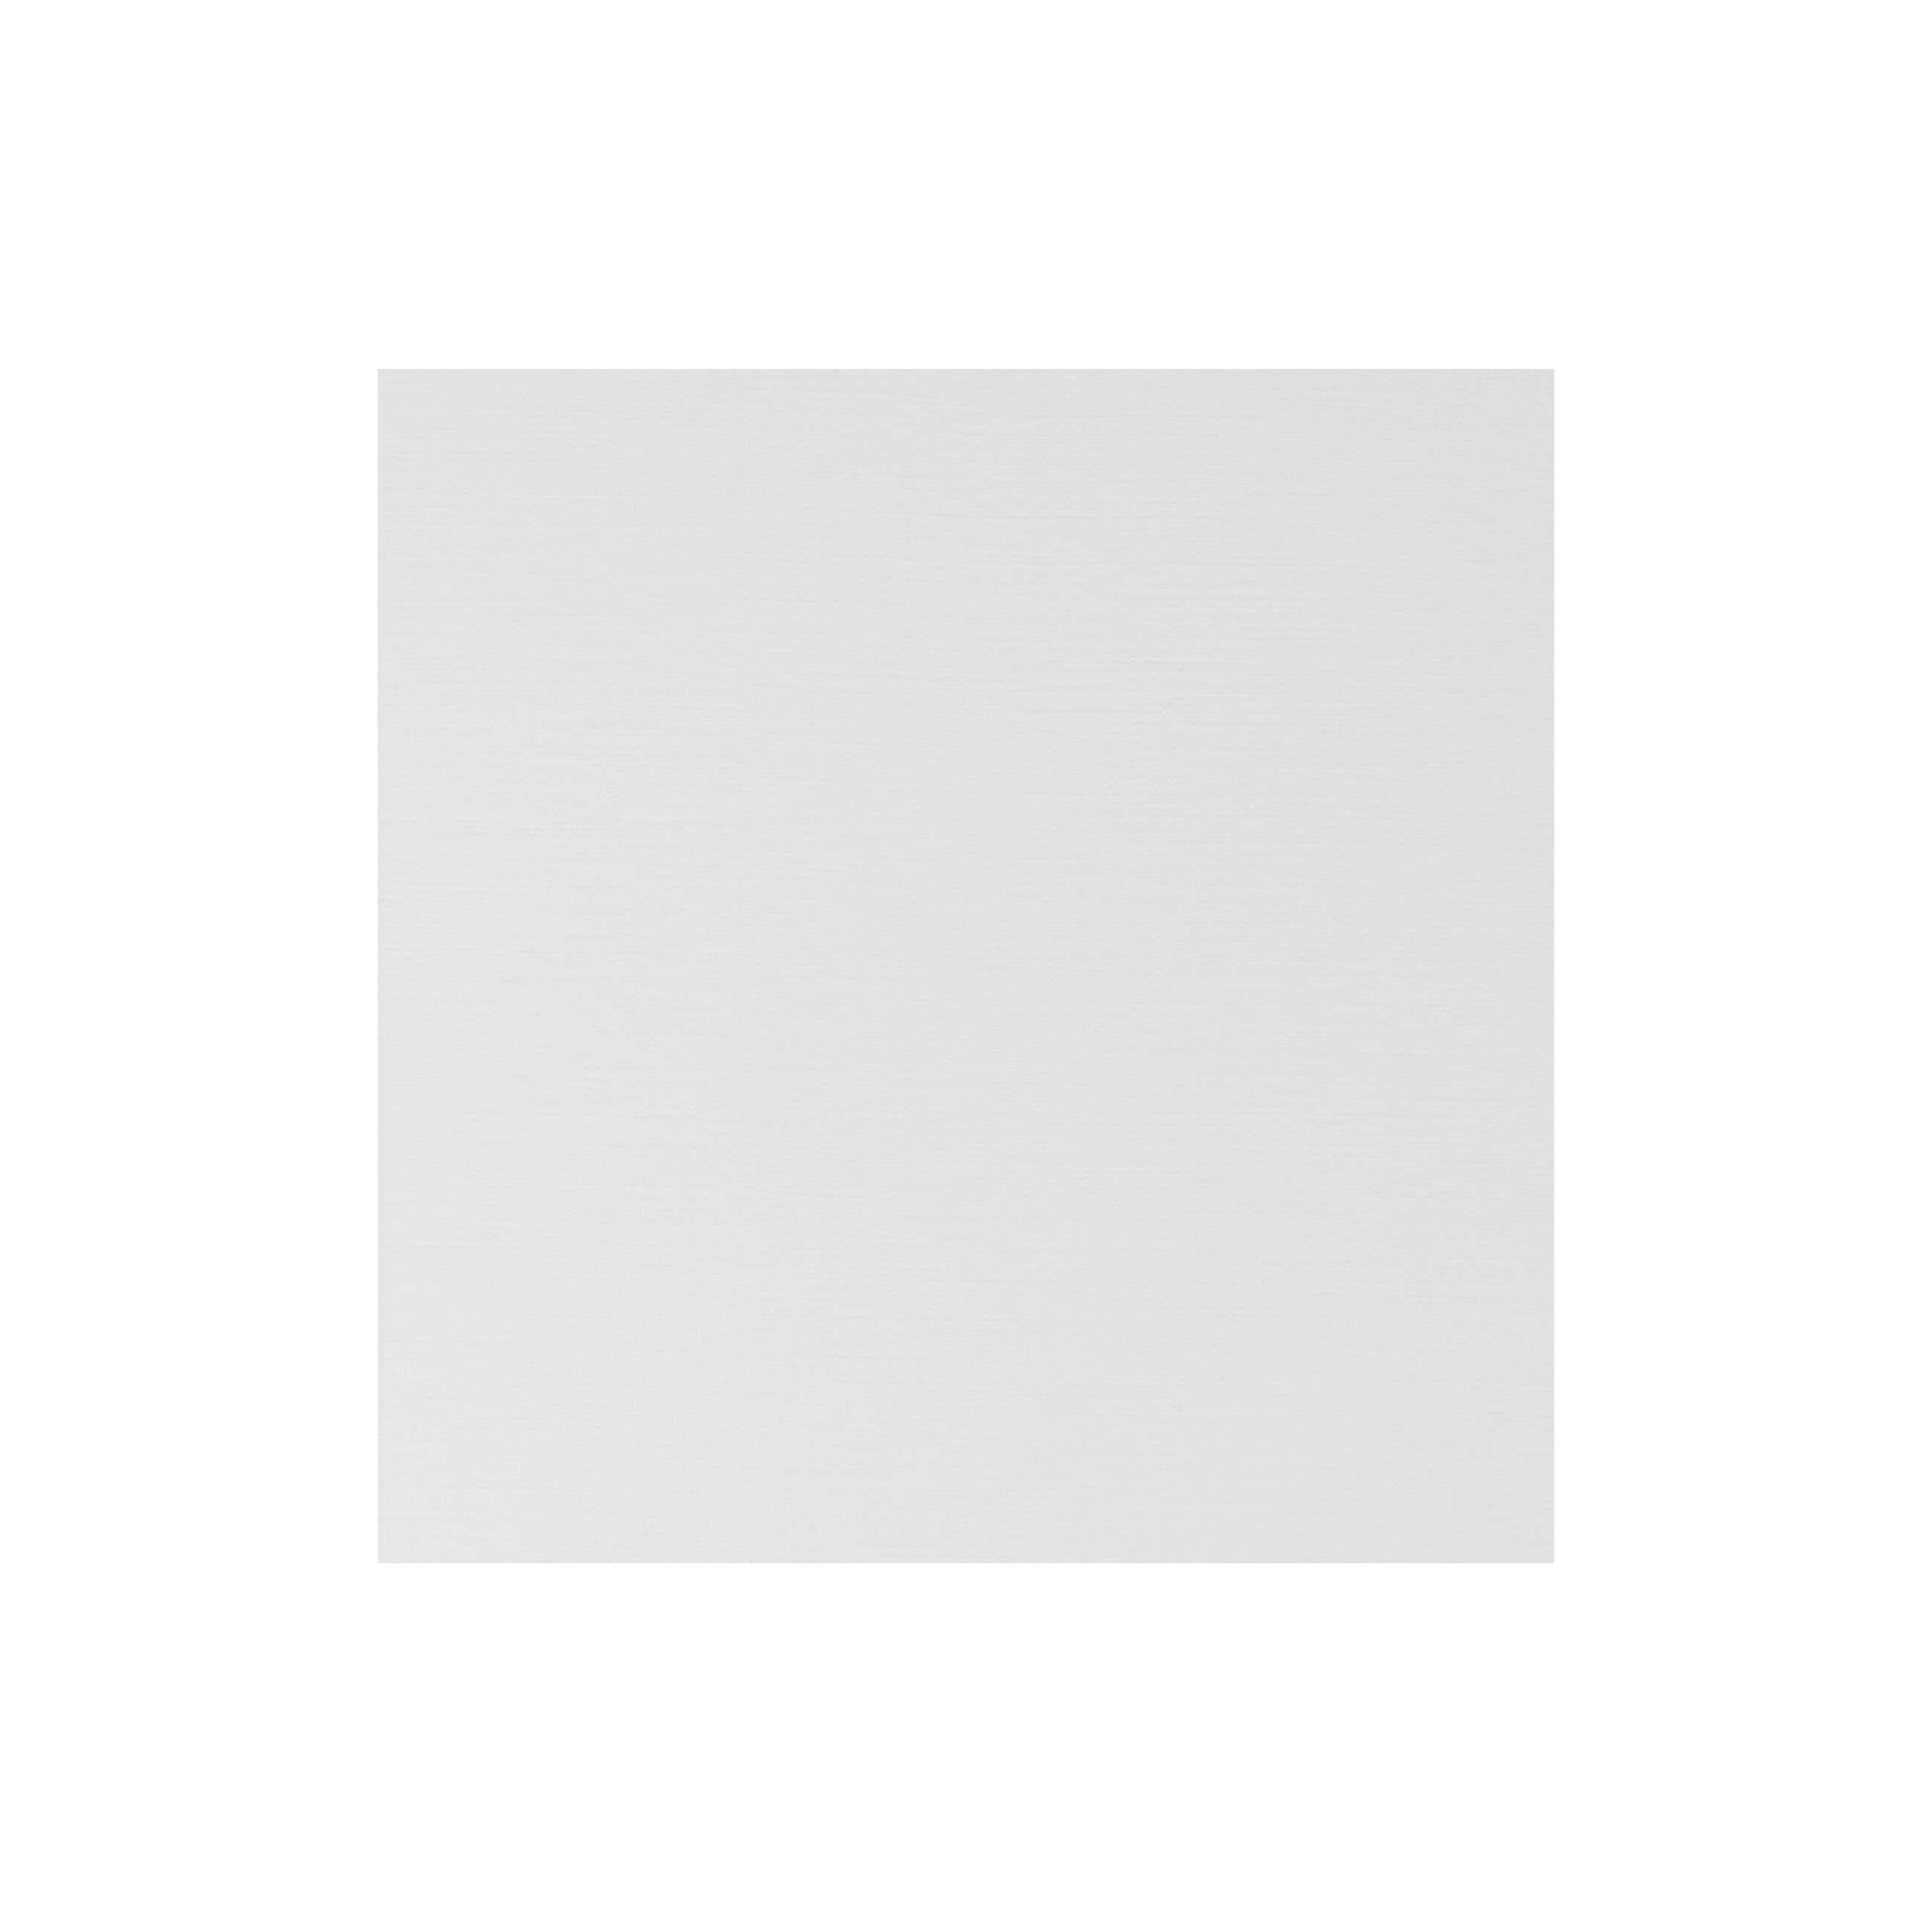 Enfolio Wallet 146mm Sq Cardpull Top - Silkweave White